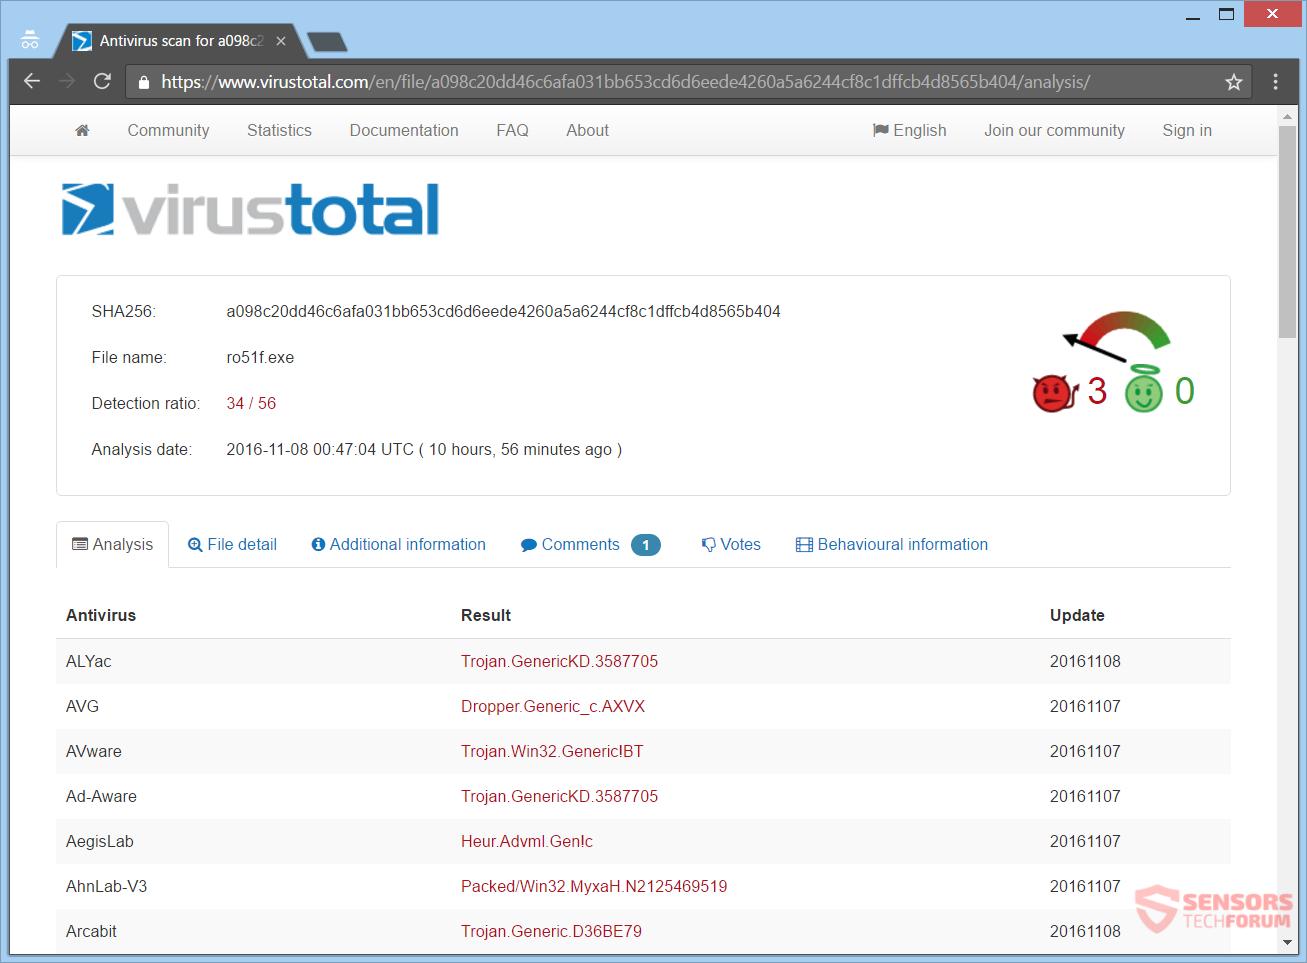 stf-cerbertear-ransomware-cerber-tear-hiddentear-copycat-virus-total-virustotal-detections